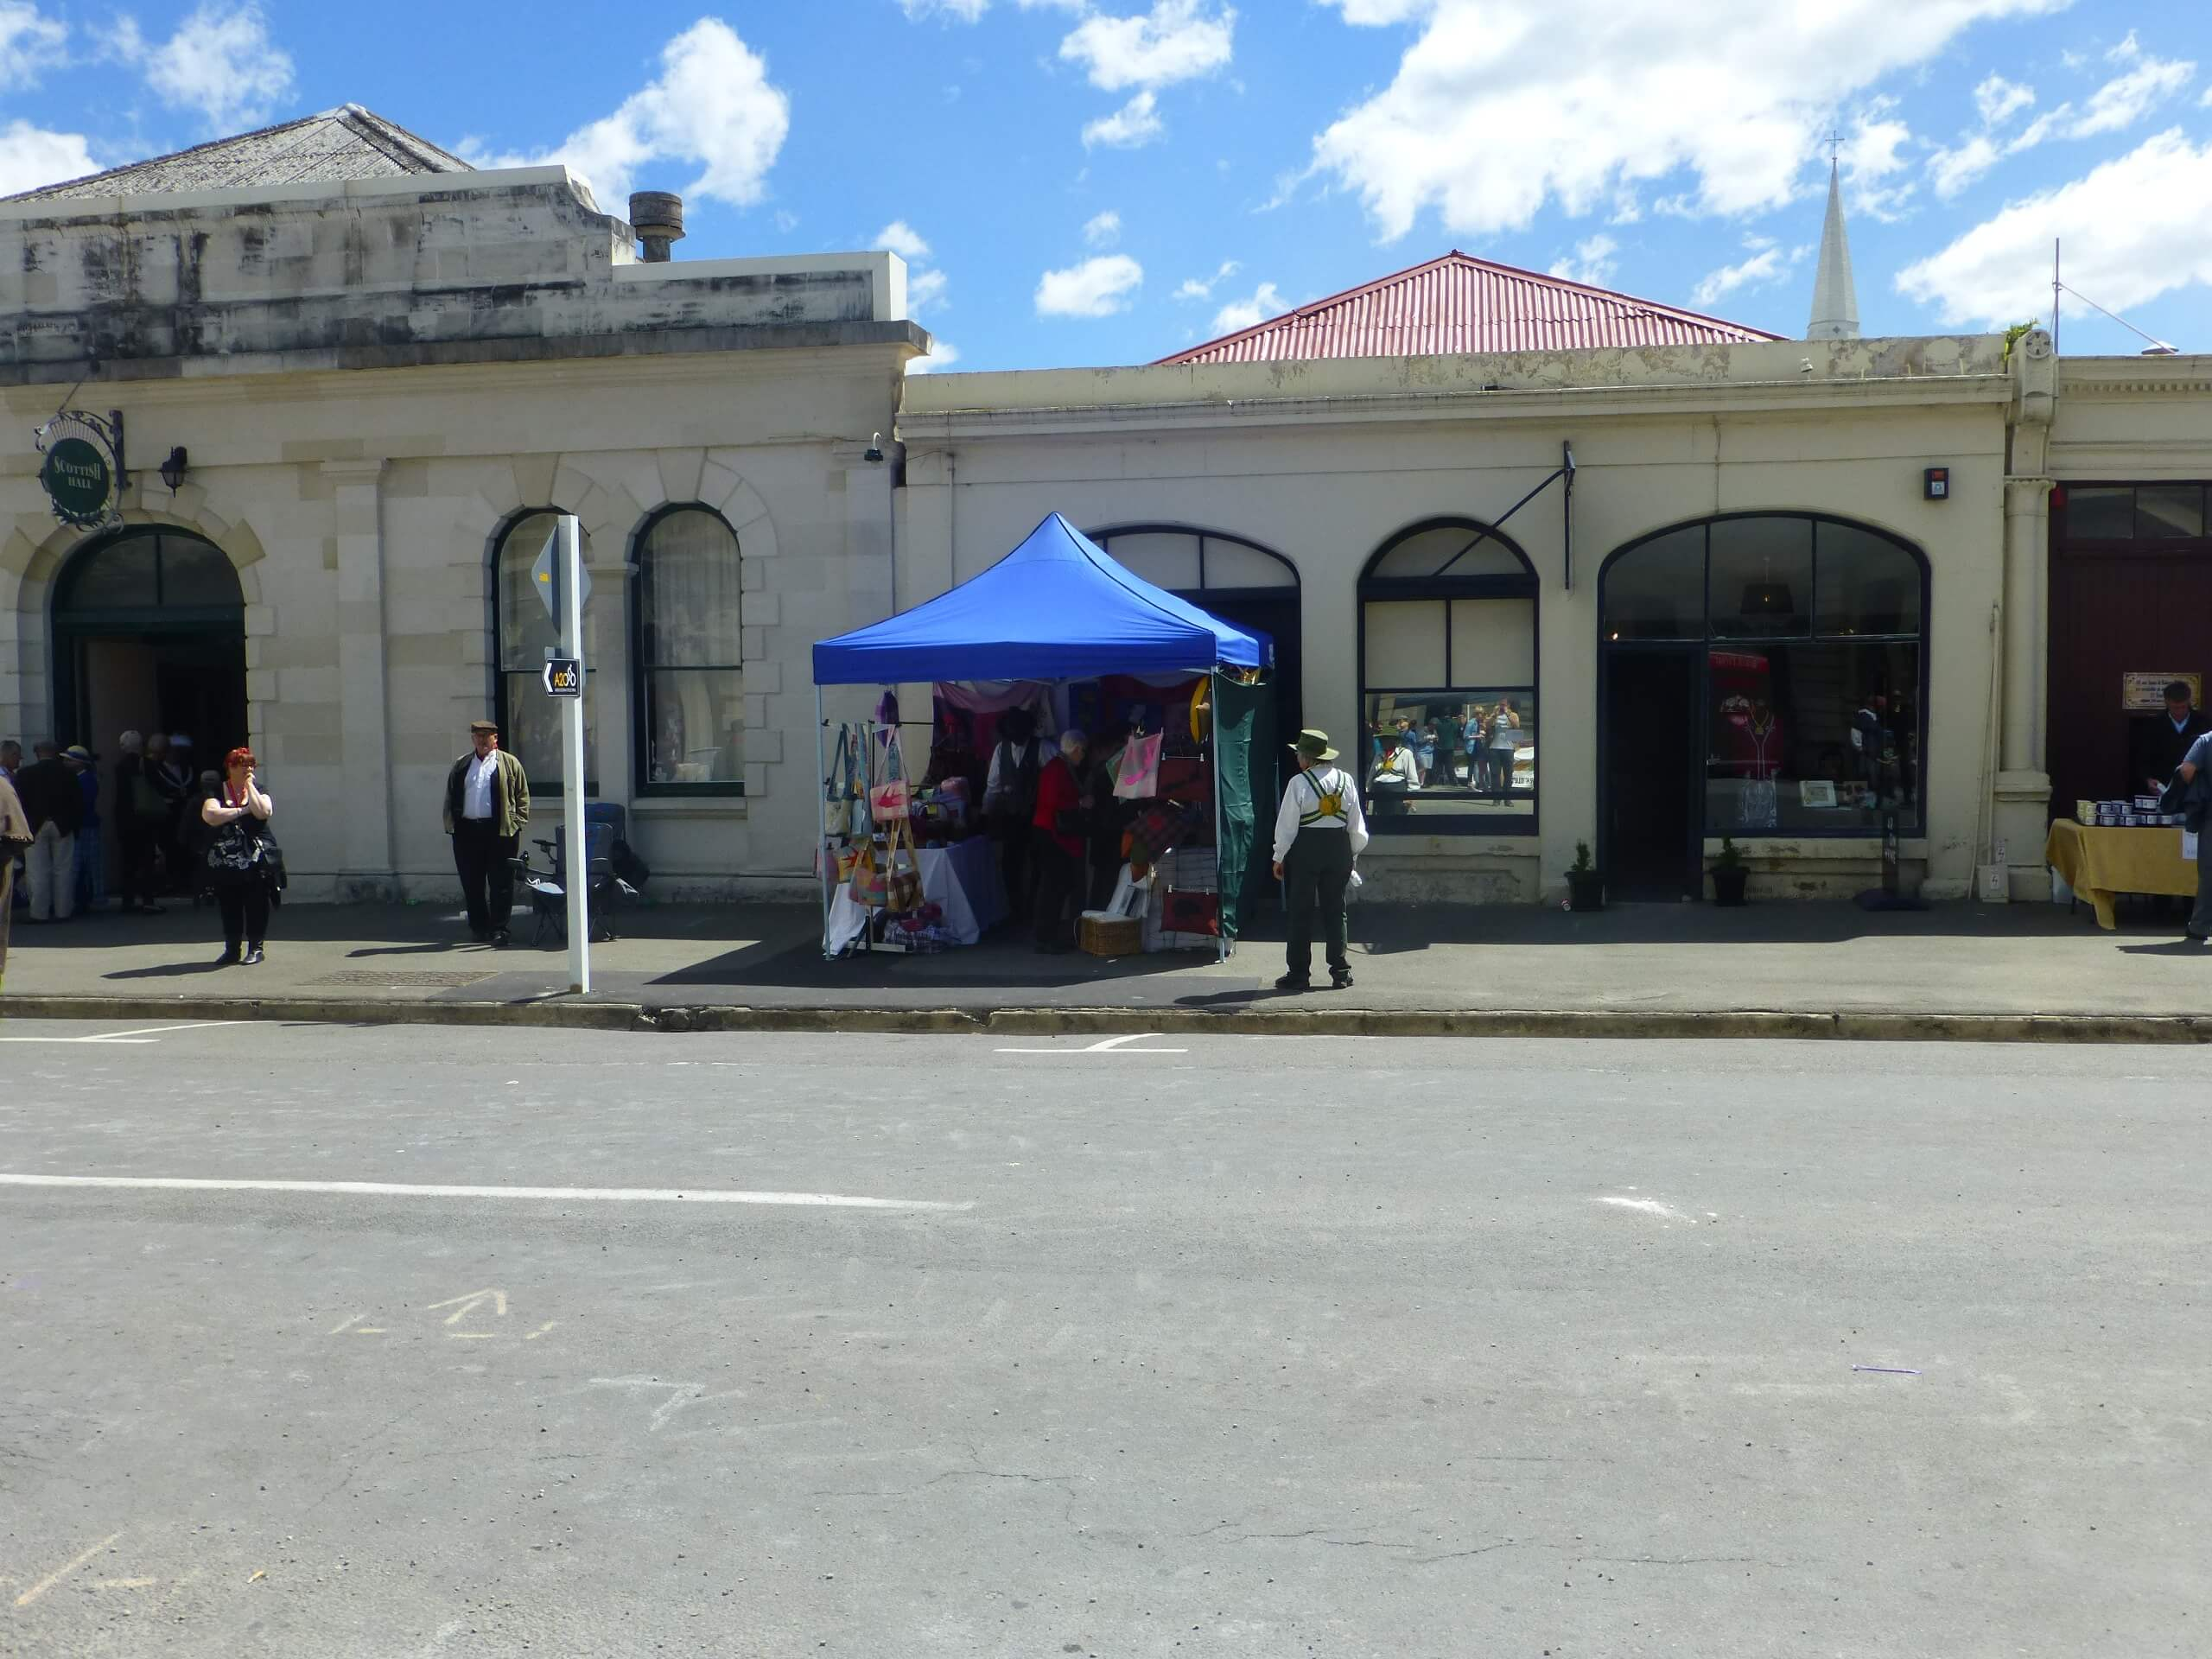 Viktorian Festival in Oamaru 17